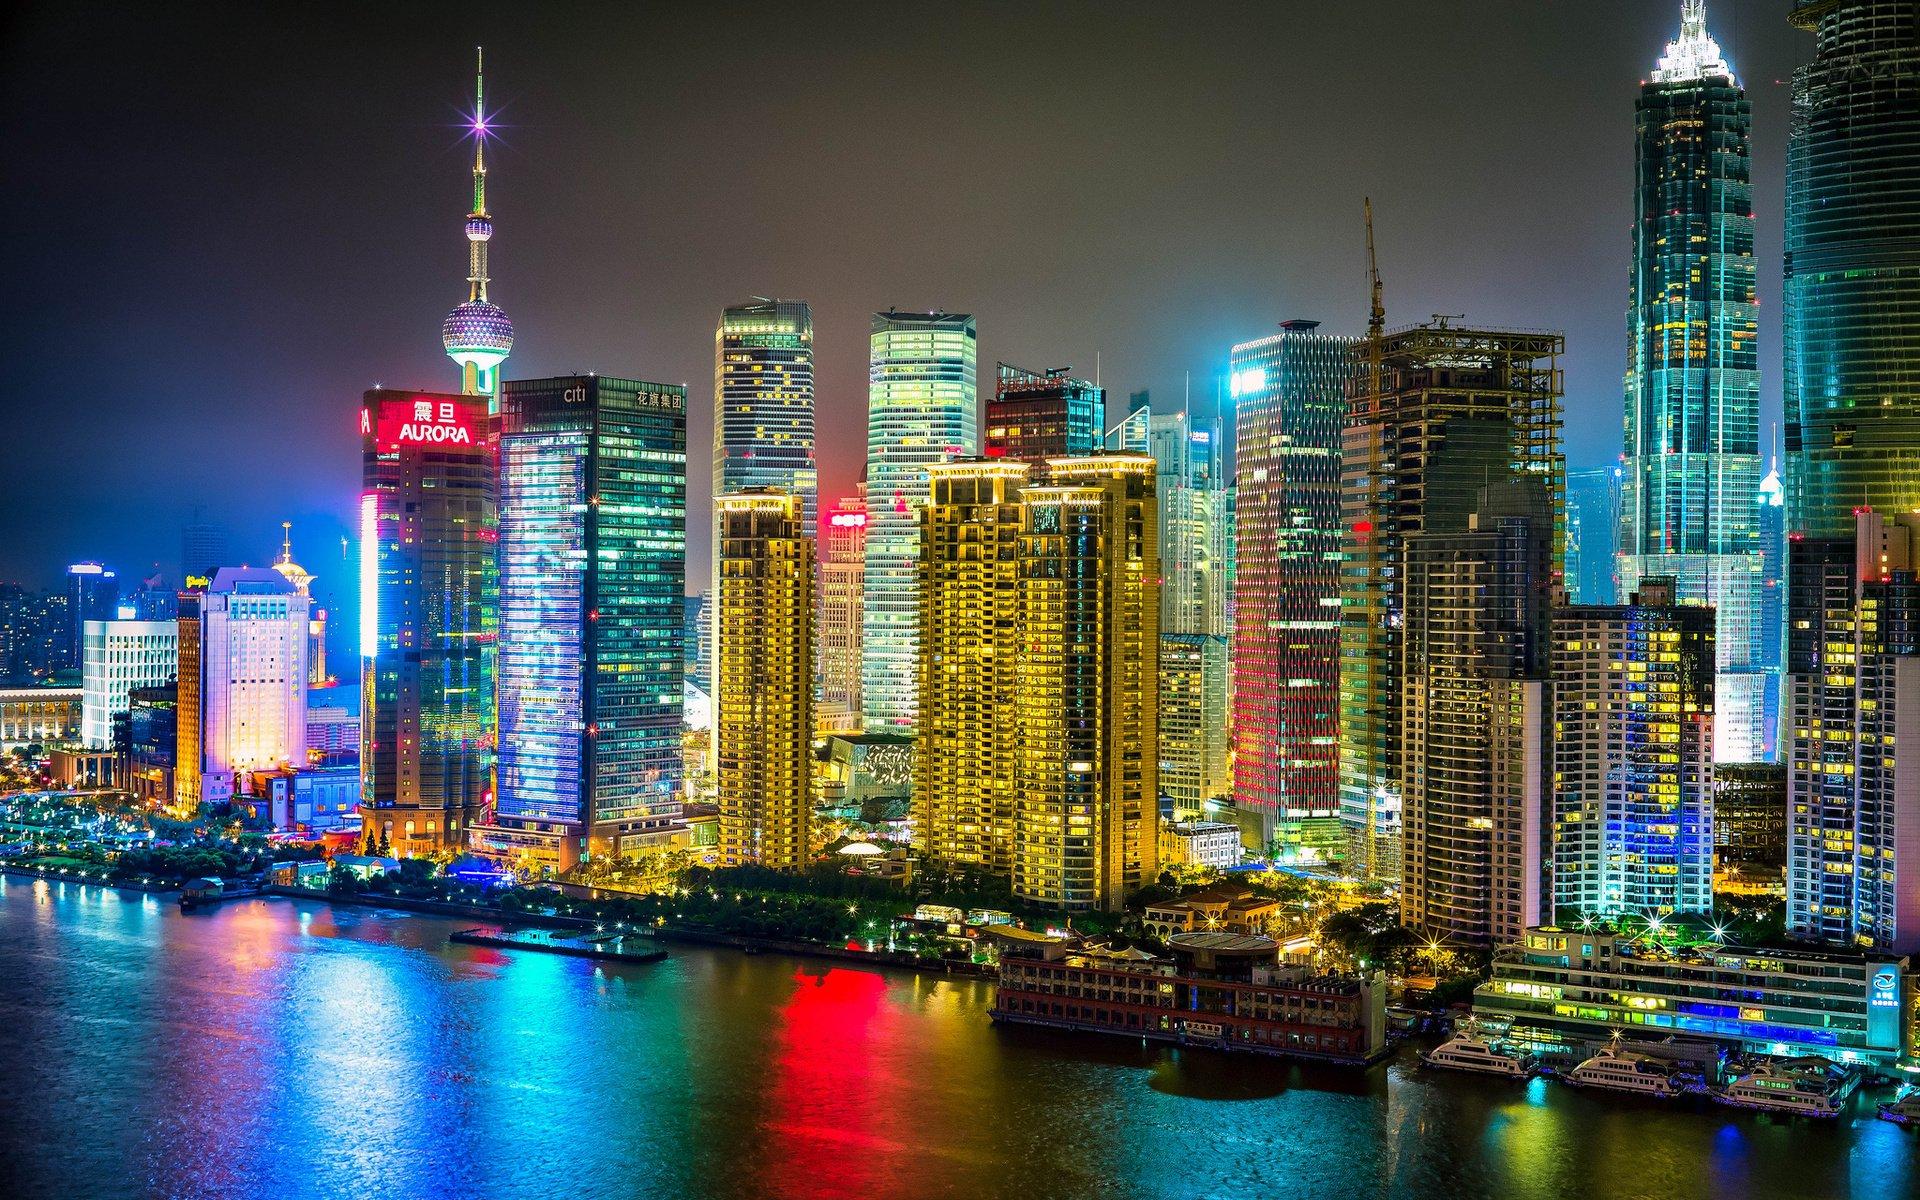 THE BUND, SHANGHAI, CHINA HD Wallpaper